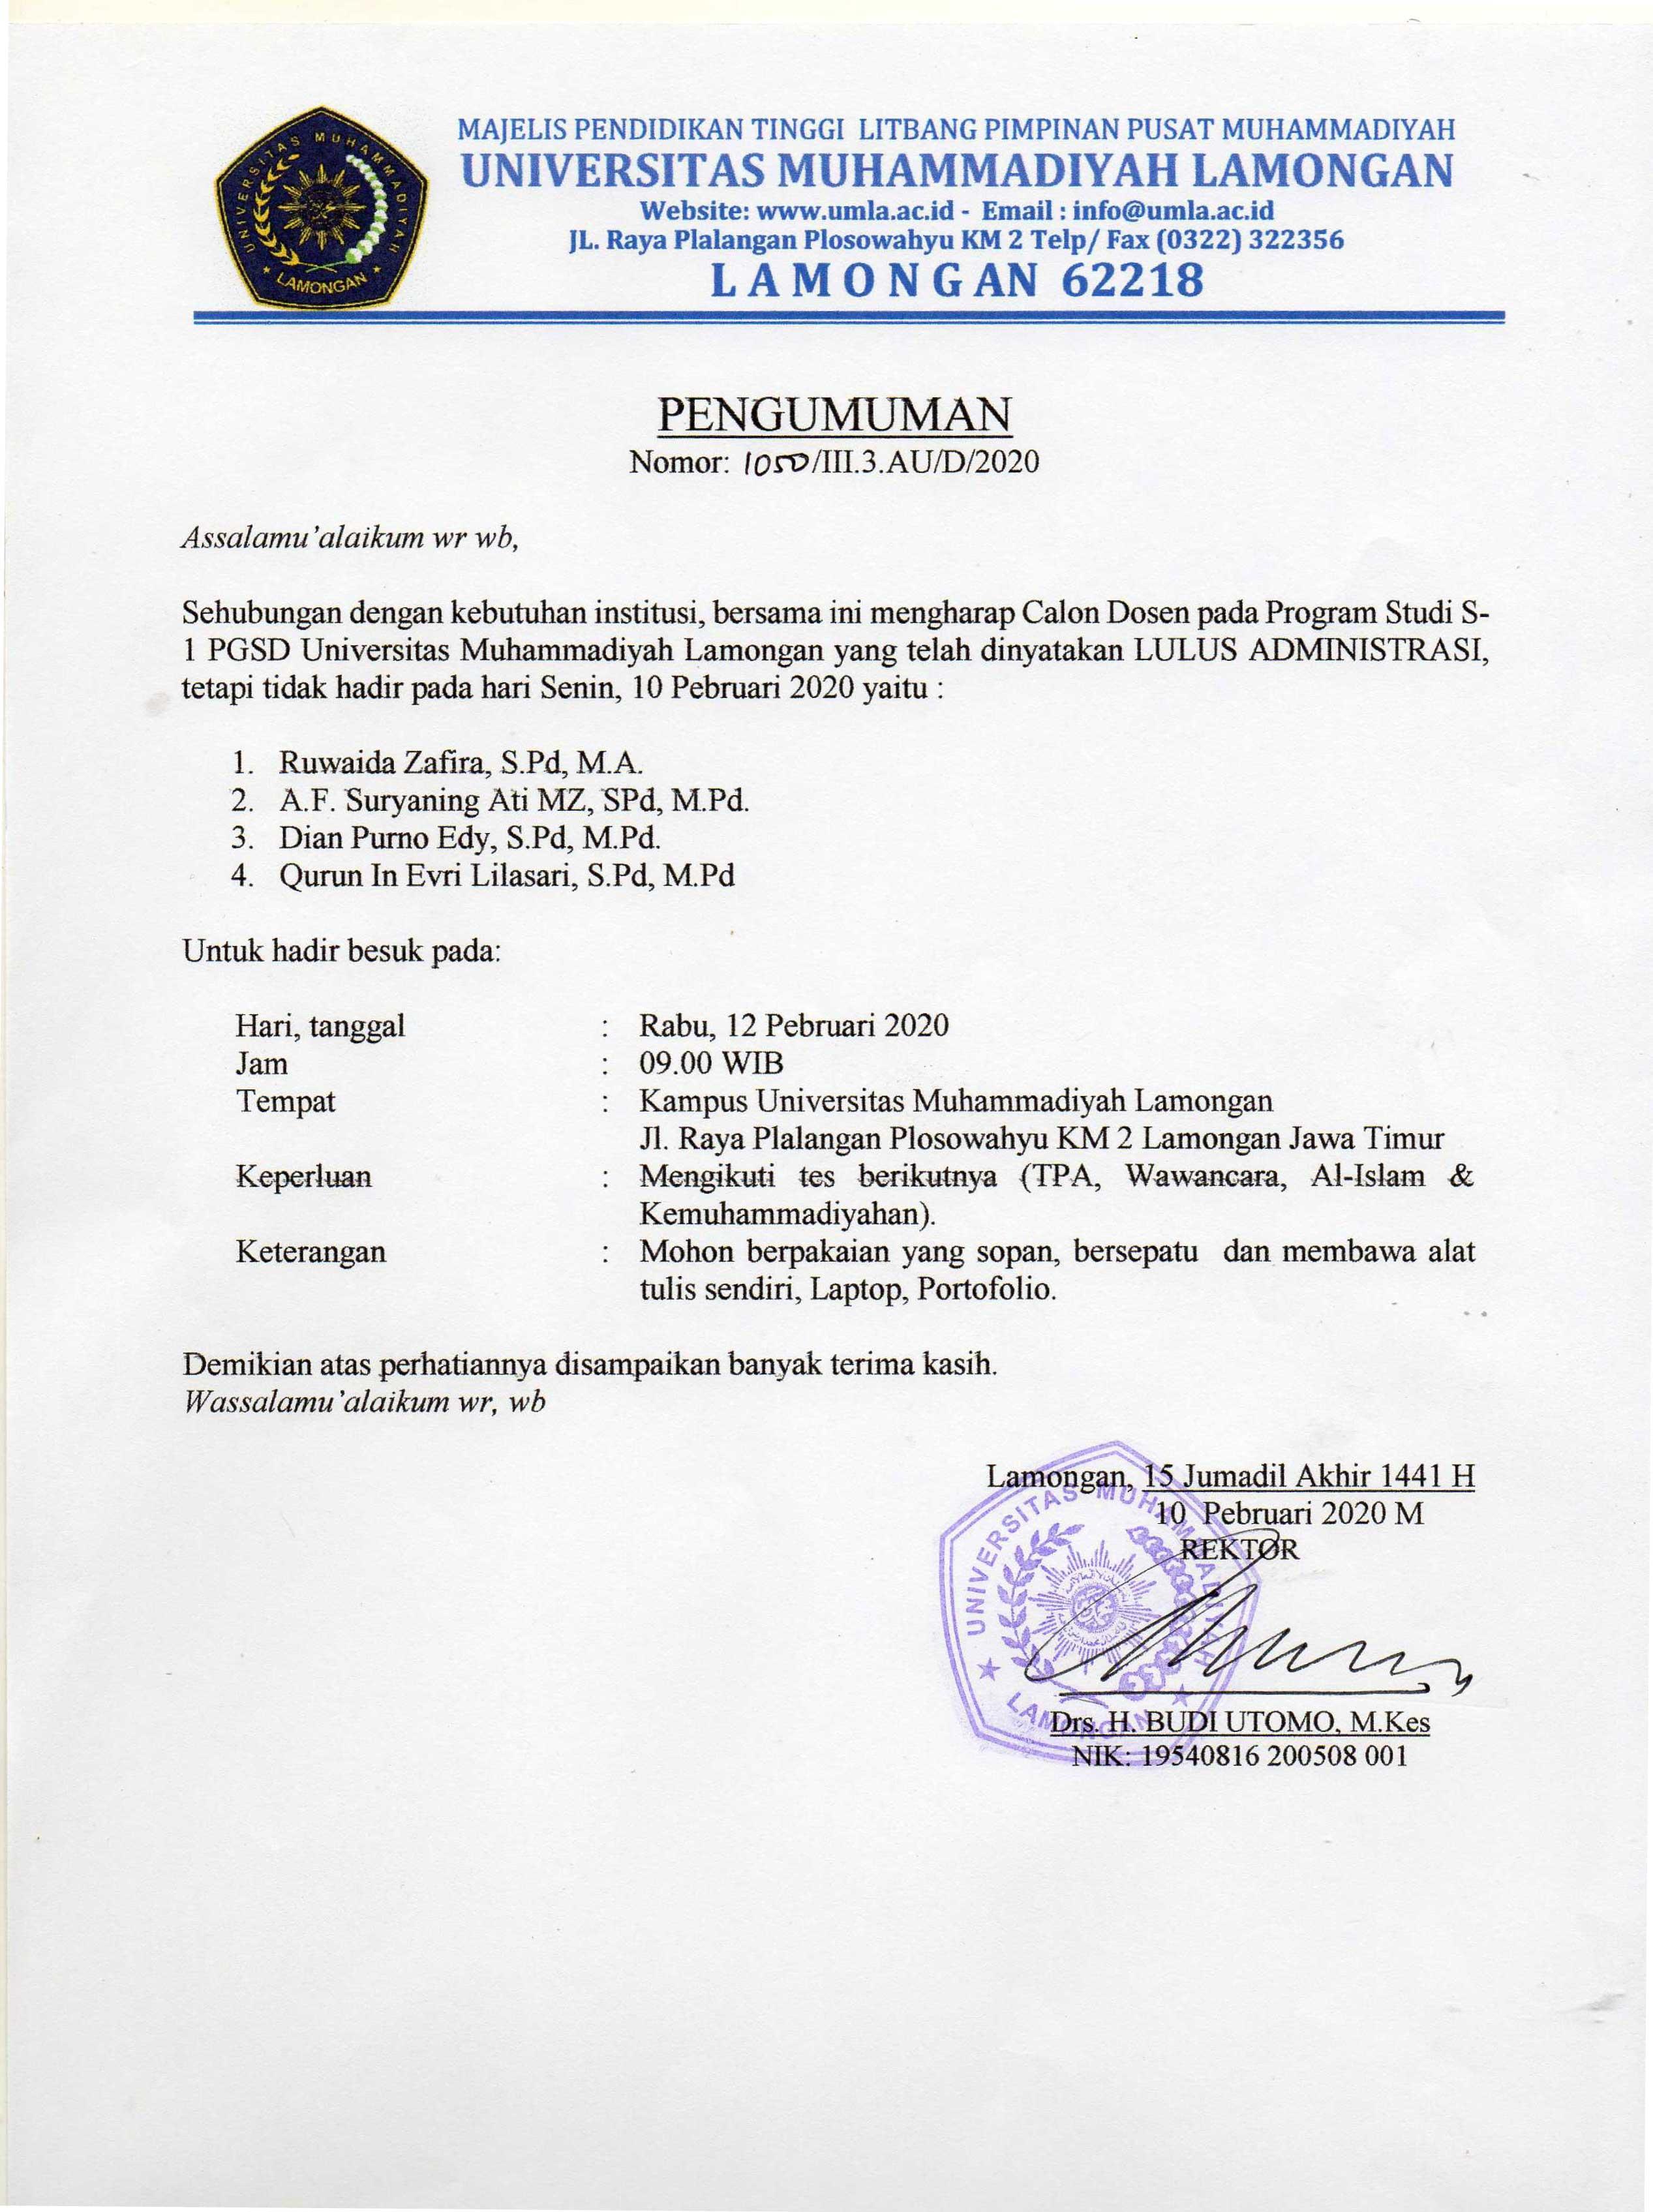 Pengumuman Calon Dosen Program Studi S1 PGSD